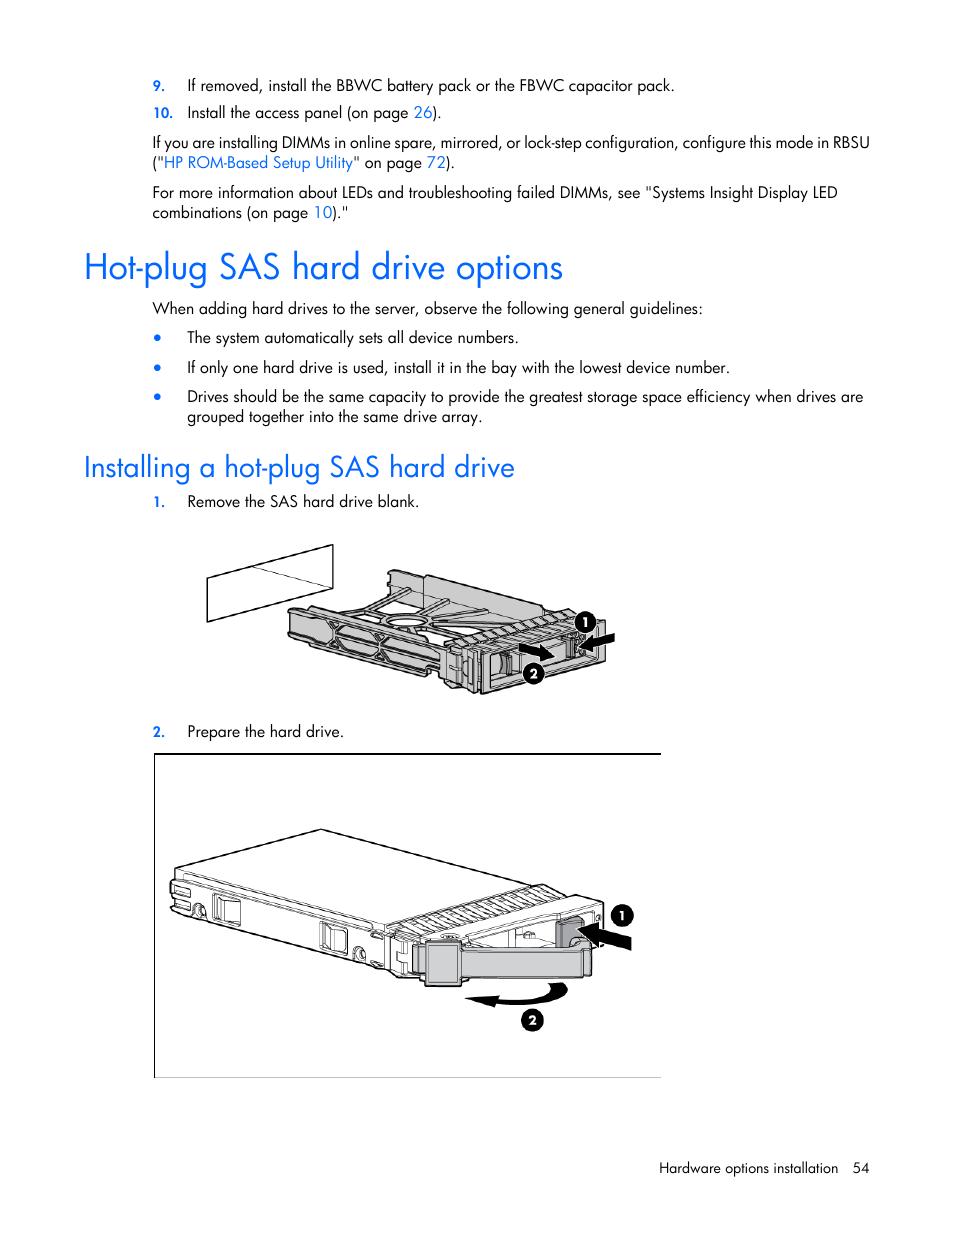 Hot-plug sas hard drive options, Installing a hot-plug sas hard